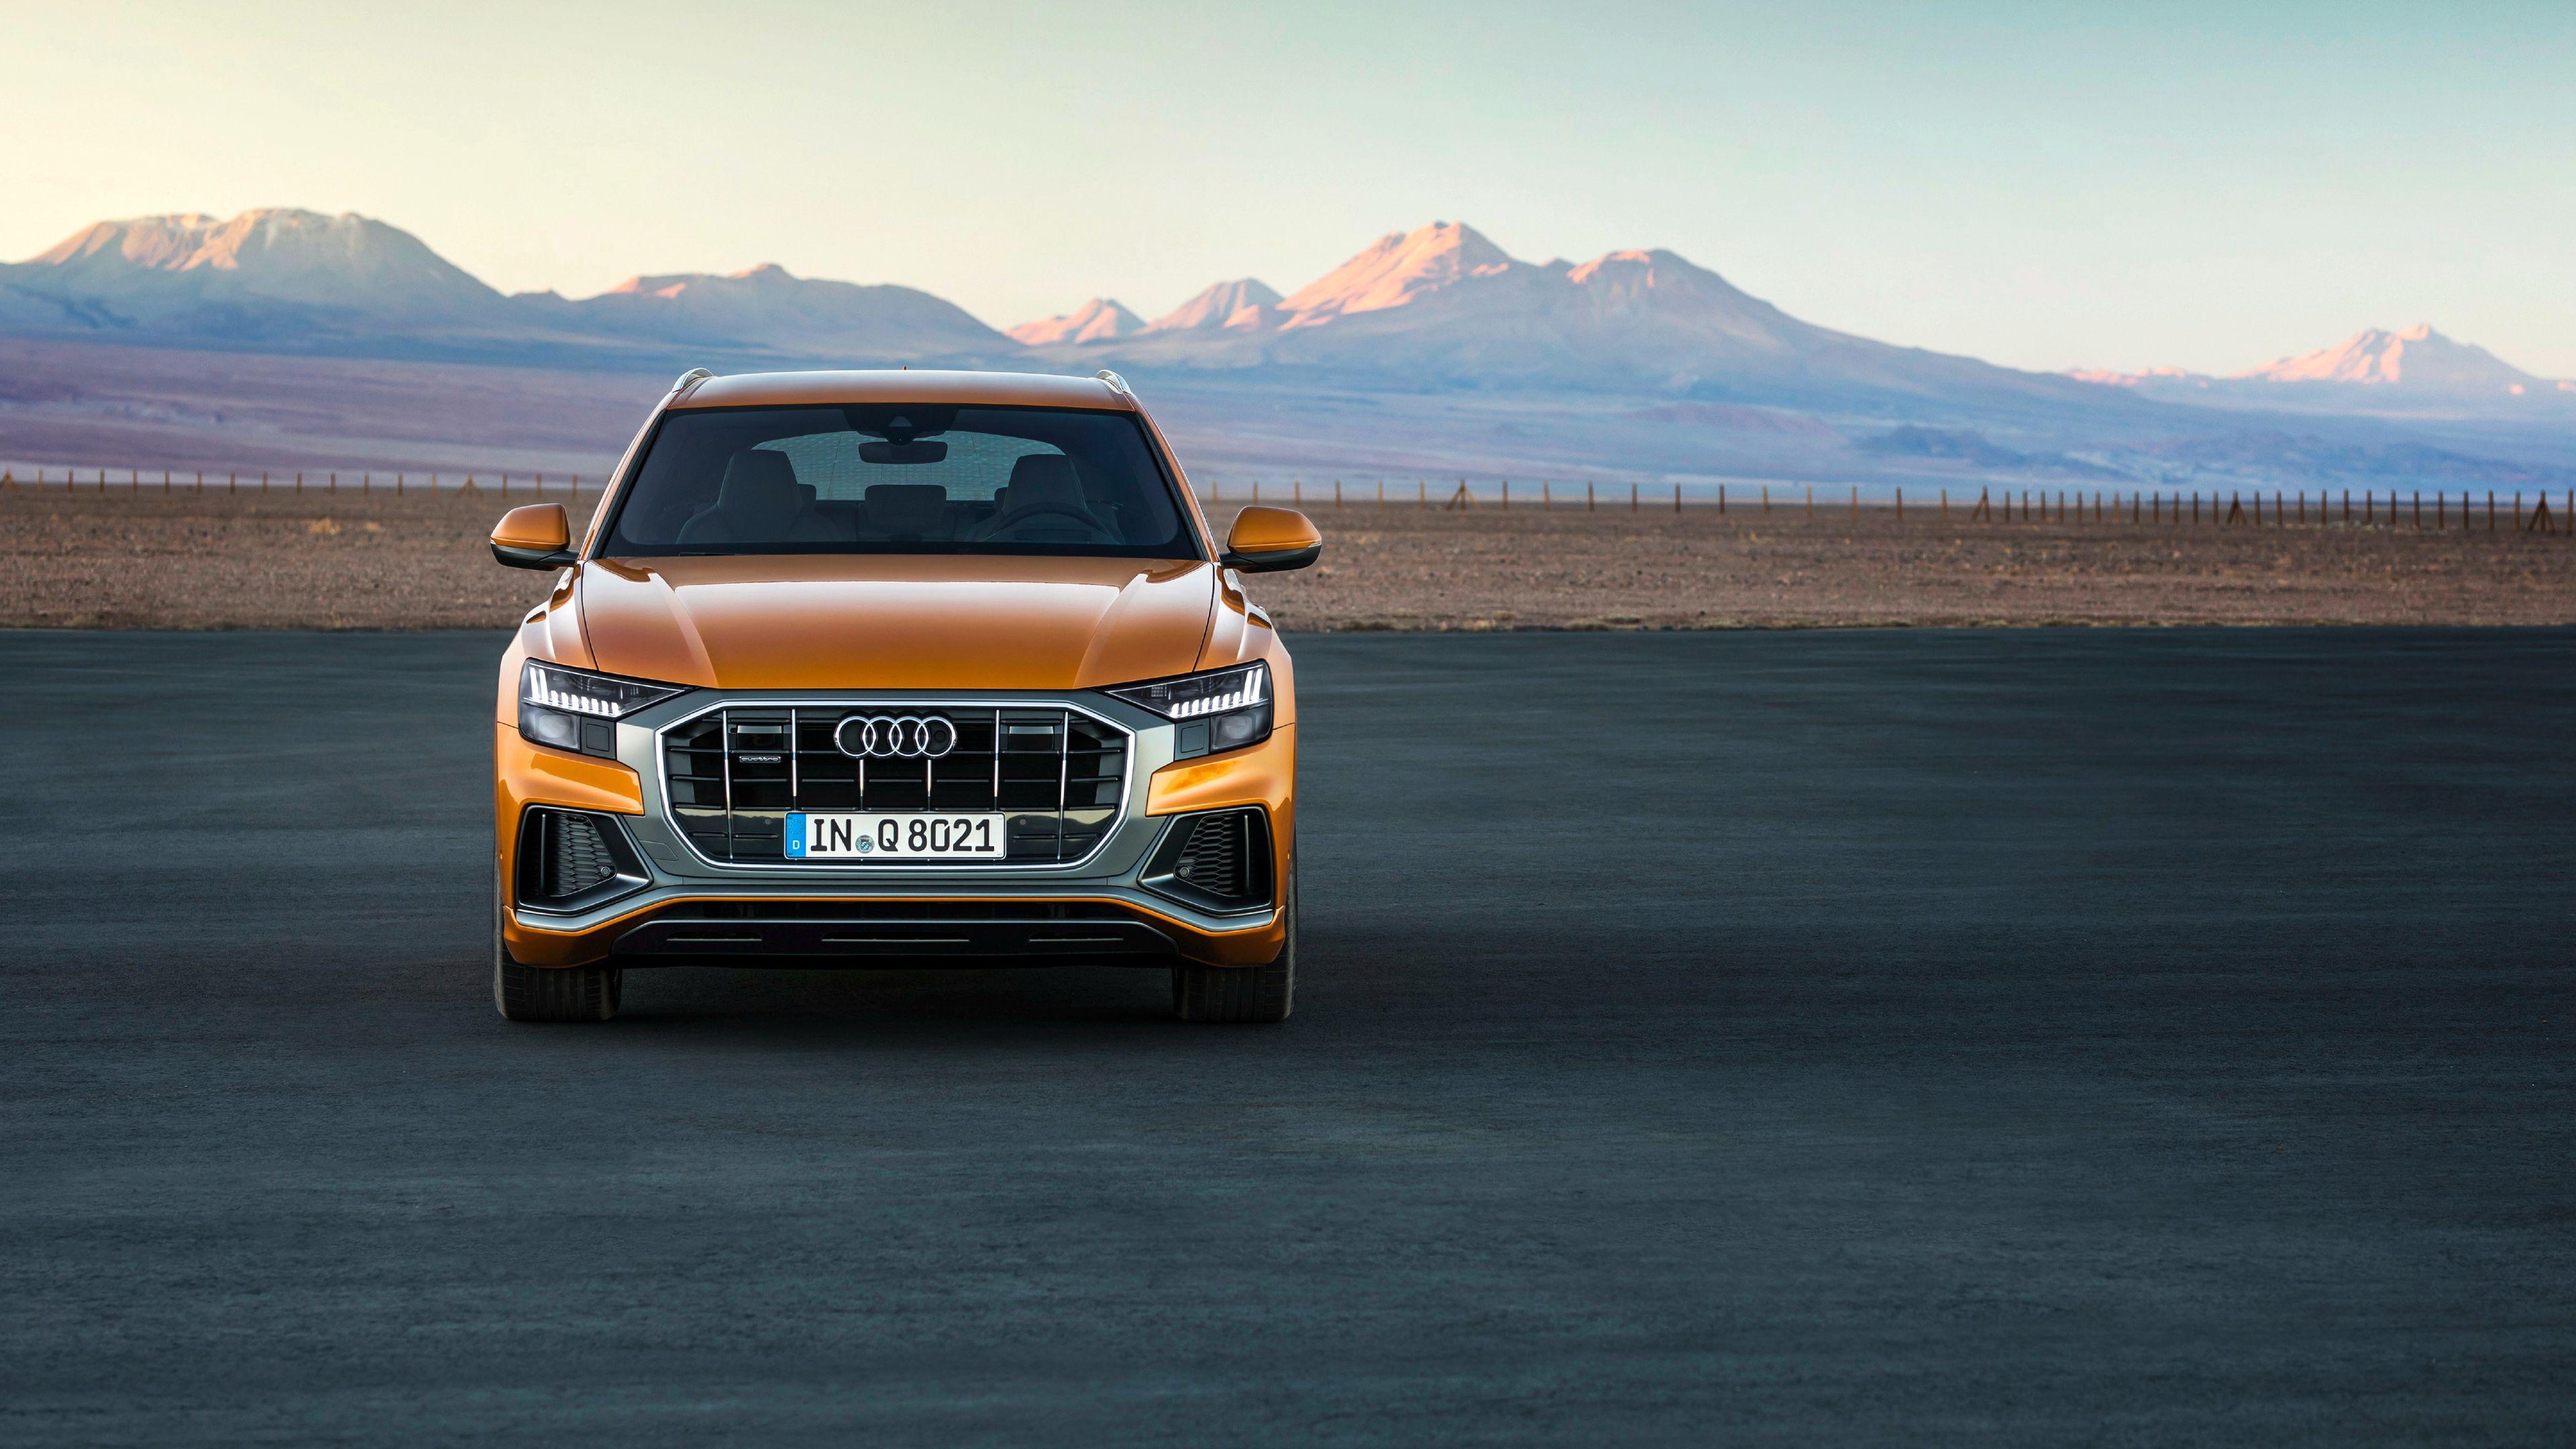 Audi Q8 Wallpapers Top Free Audi Q8 Backgrounds Wallpaperaccess